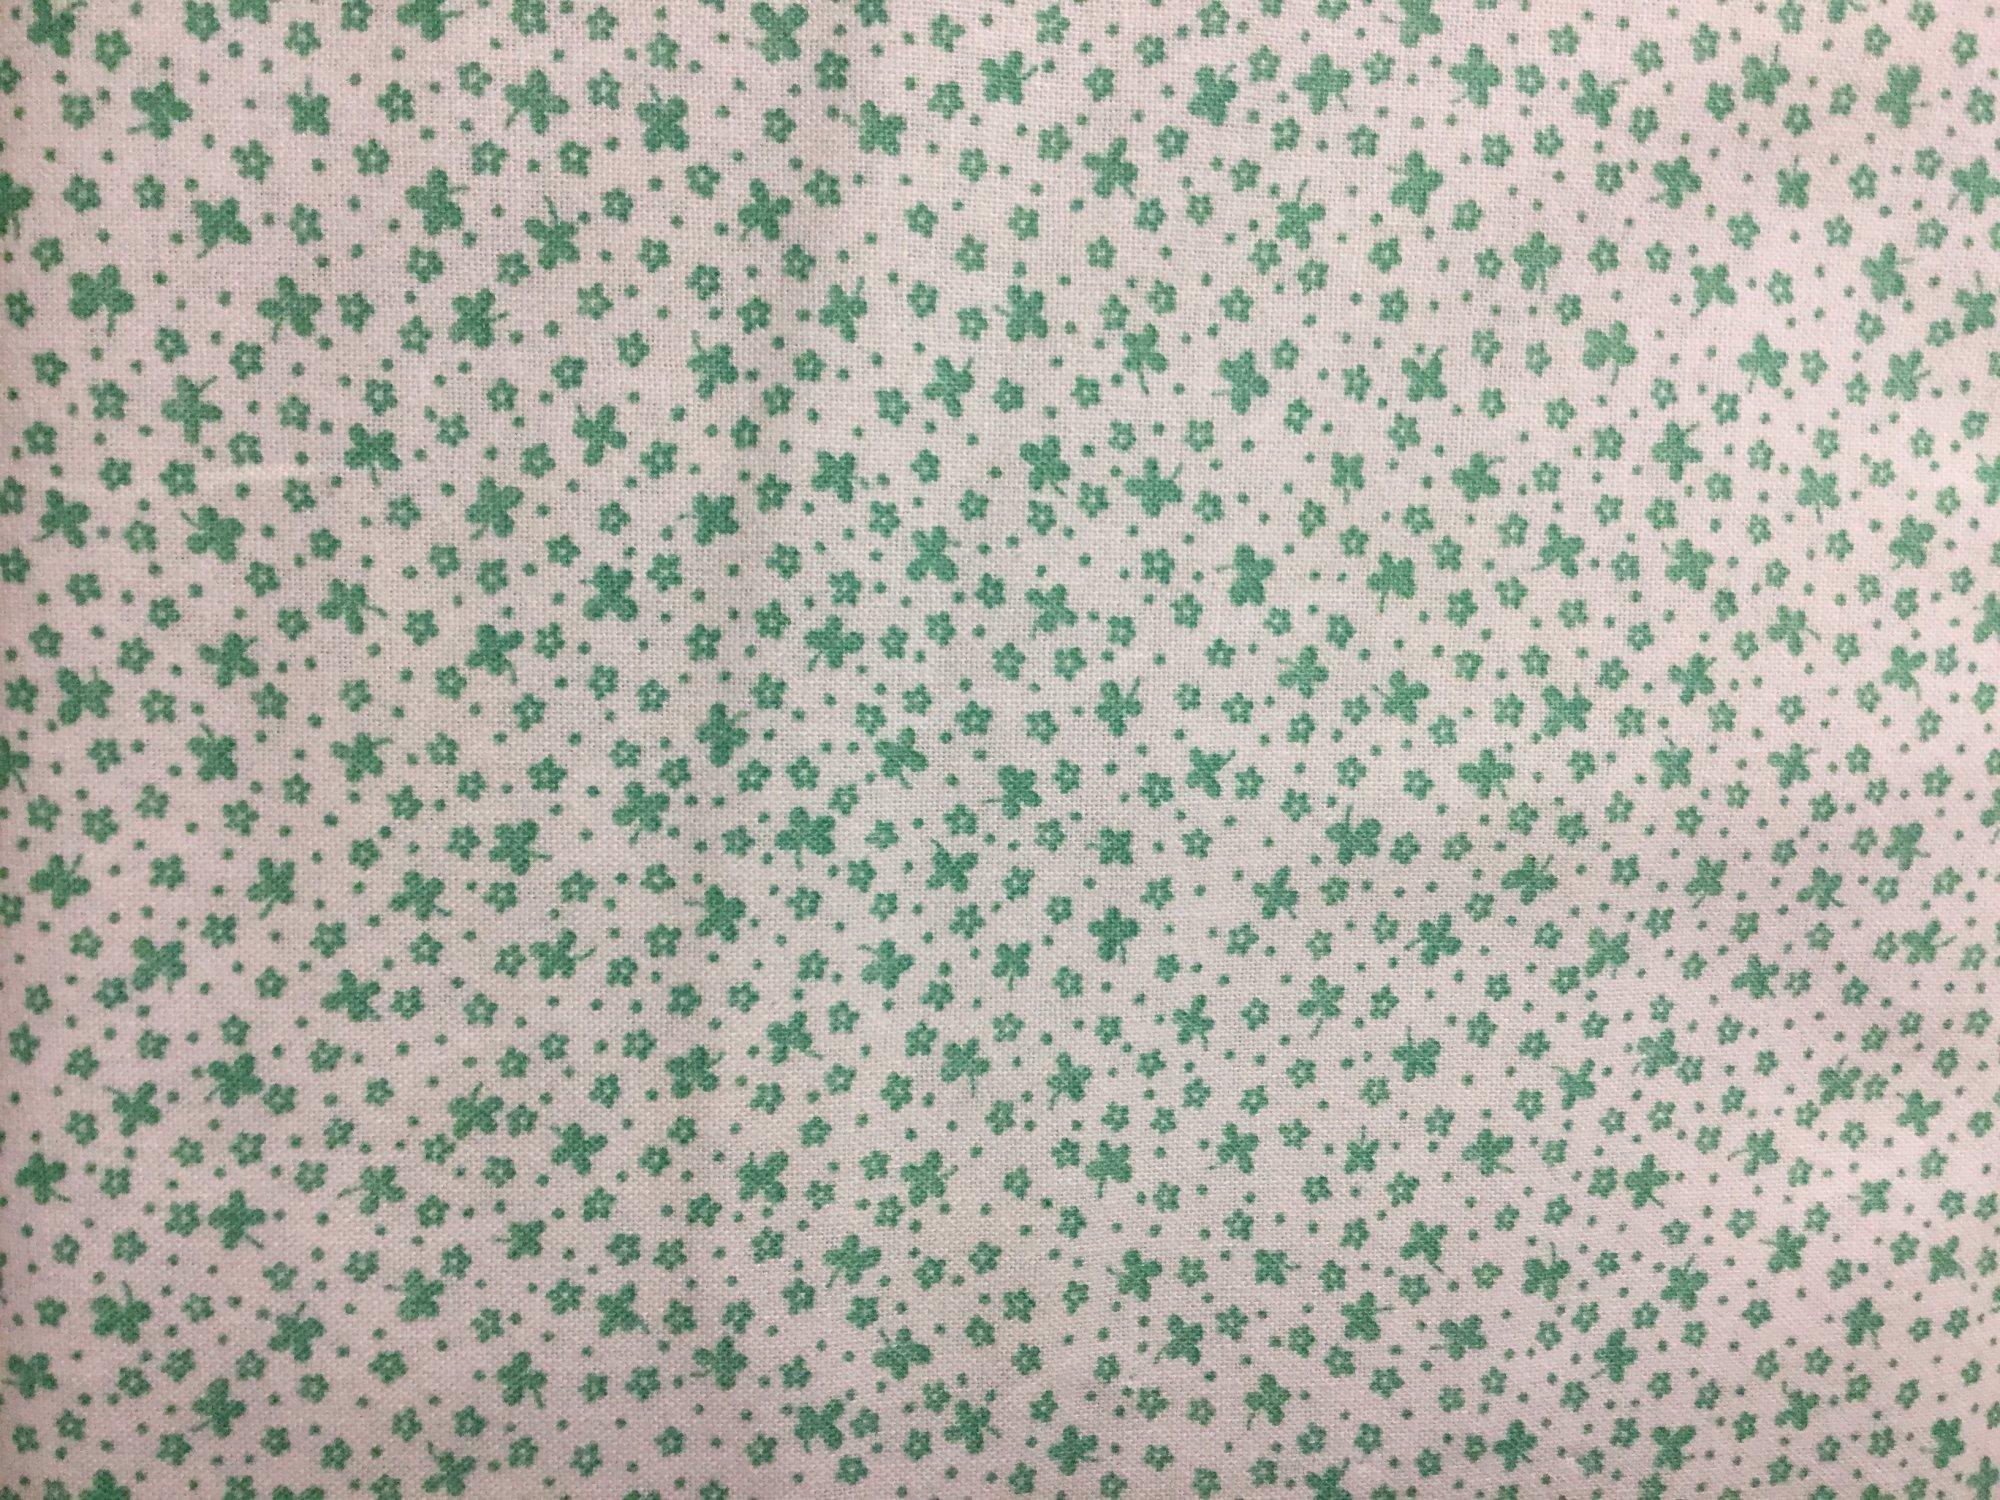 Green on cream 1970